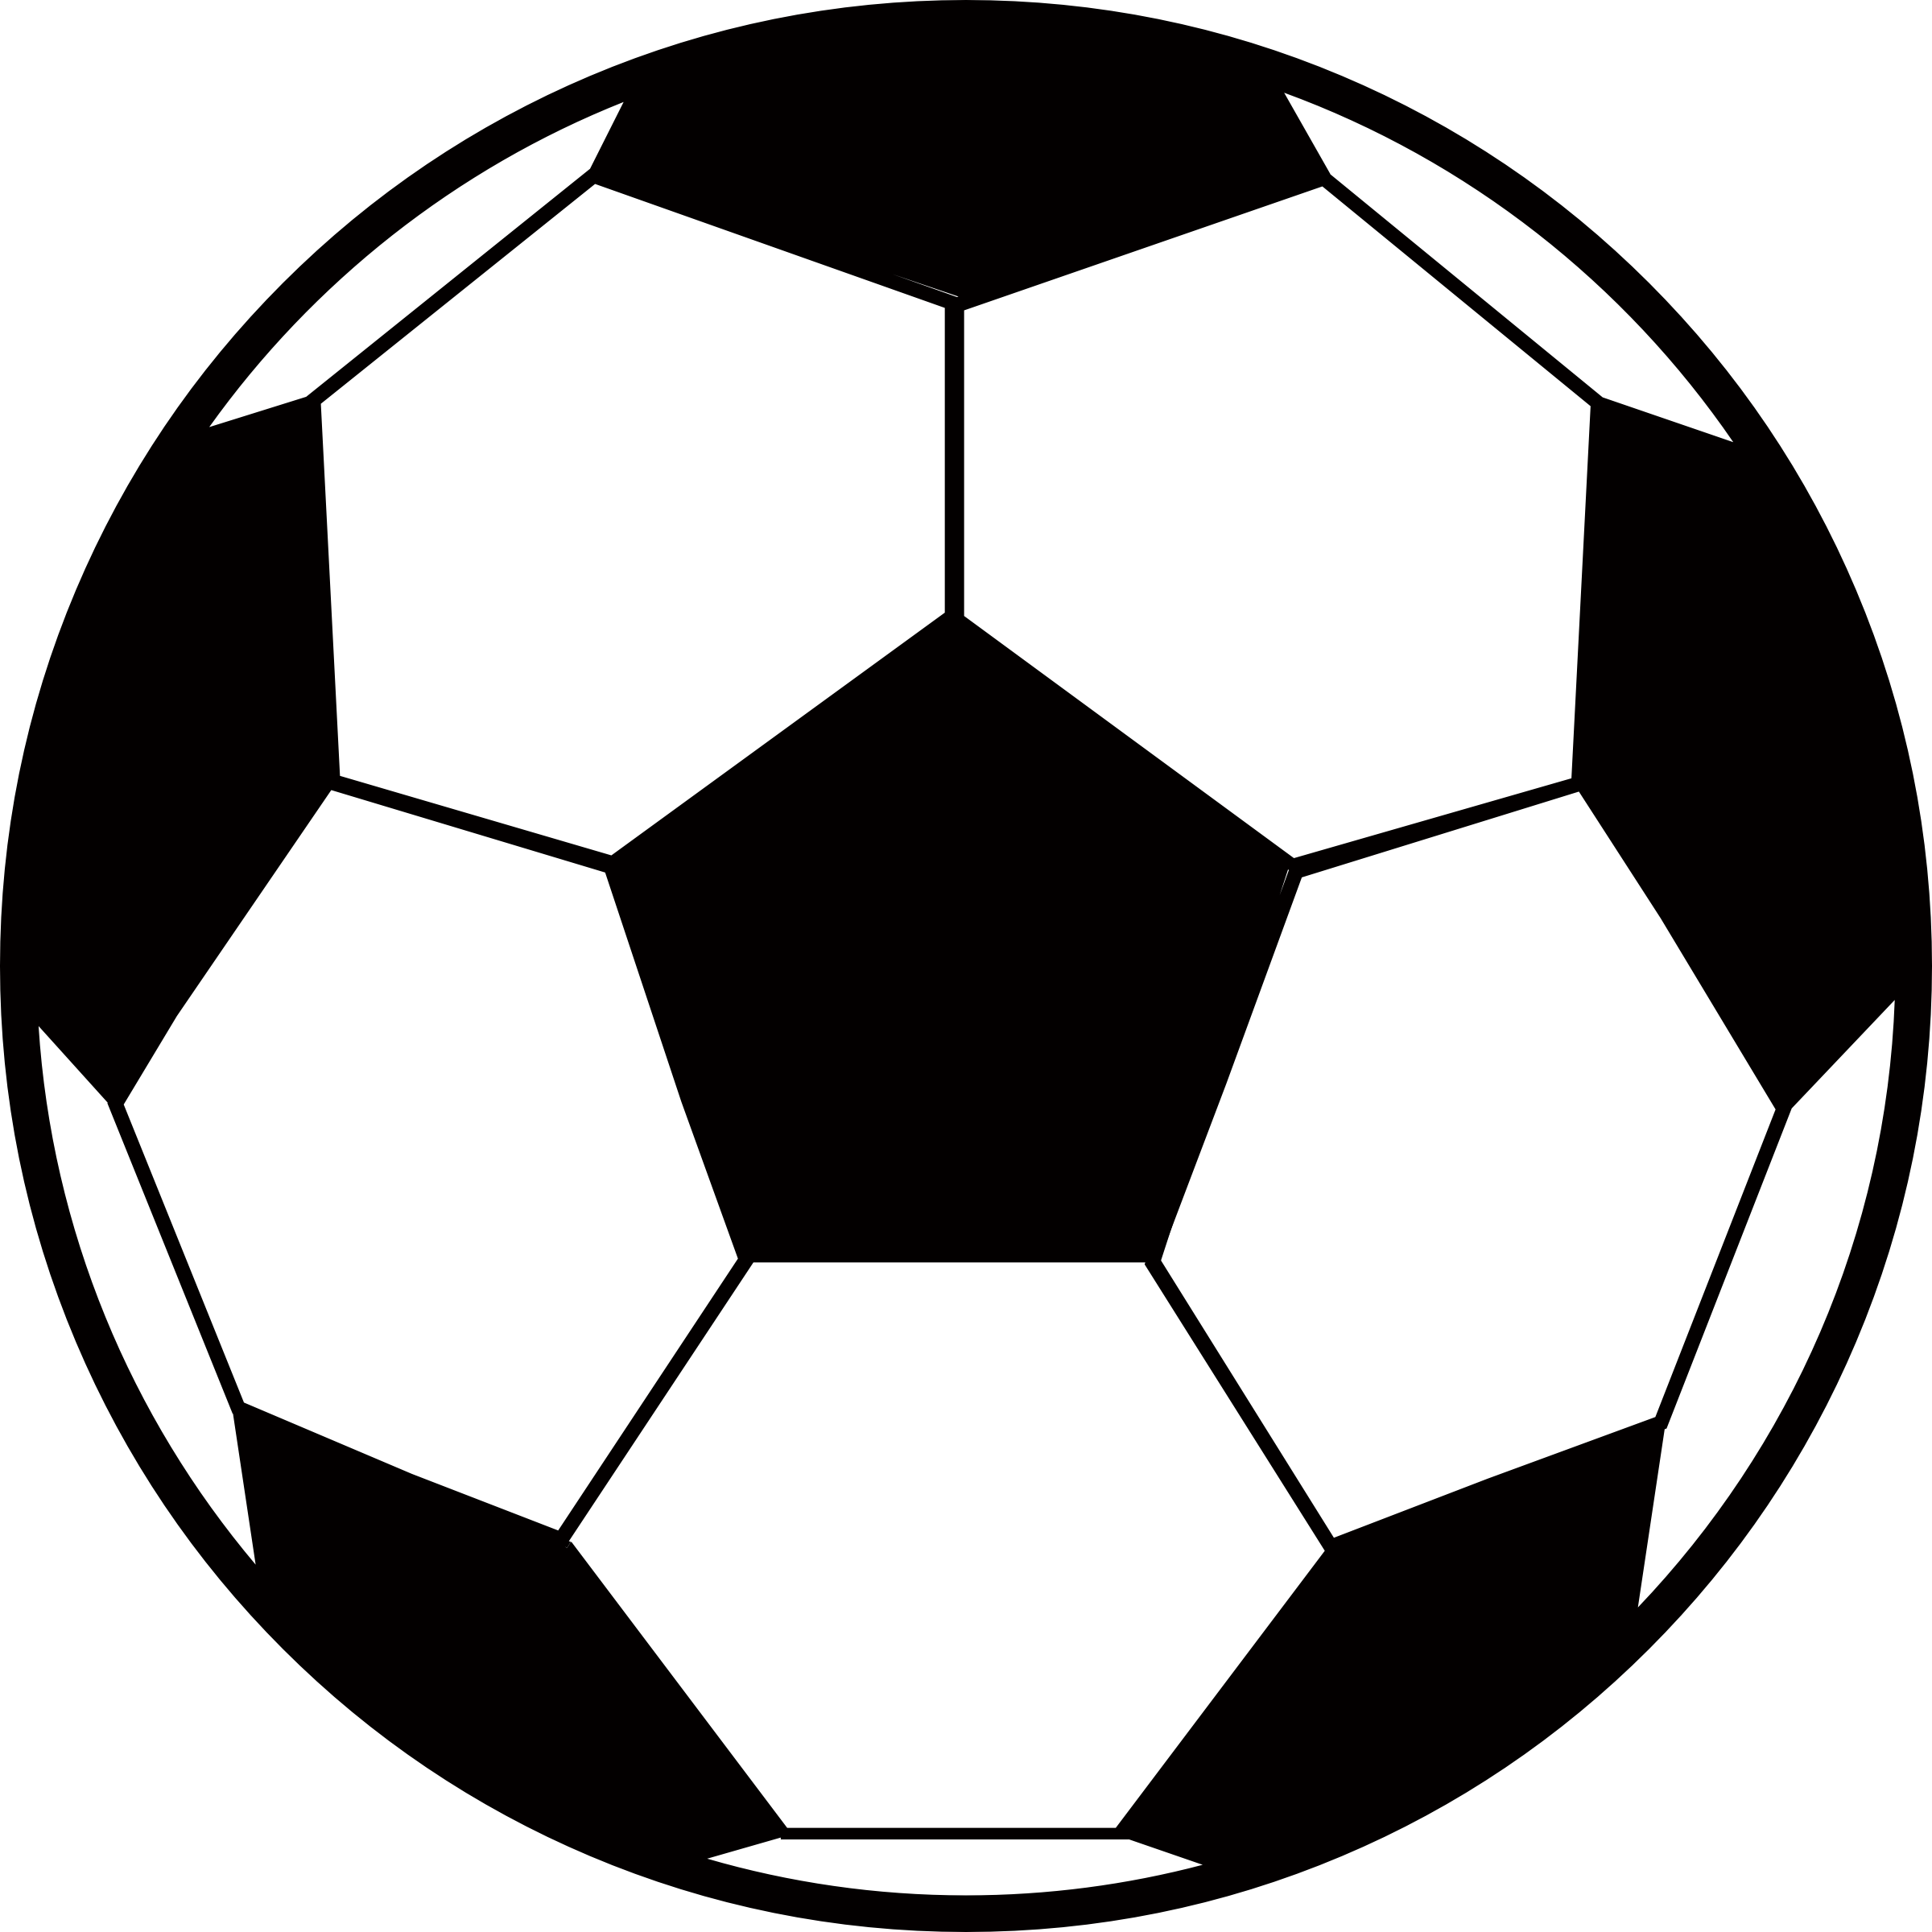 clipart soccer ball 2 rh openclipart org soccer ball clip art no background soccer ball clip art images